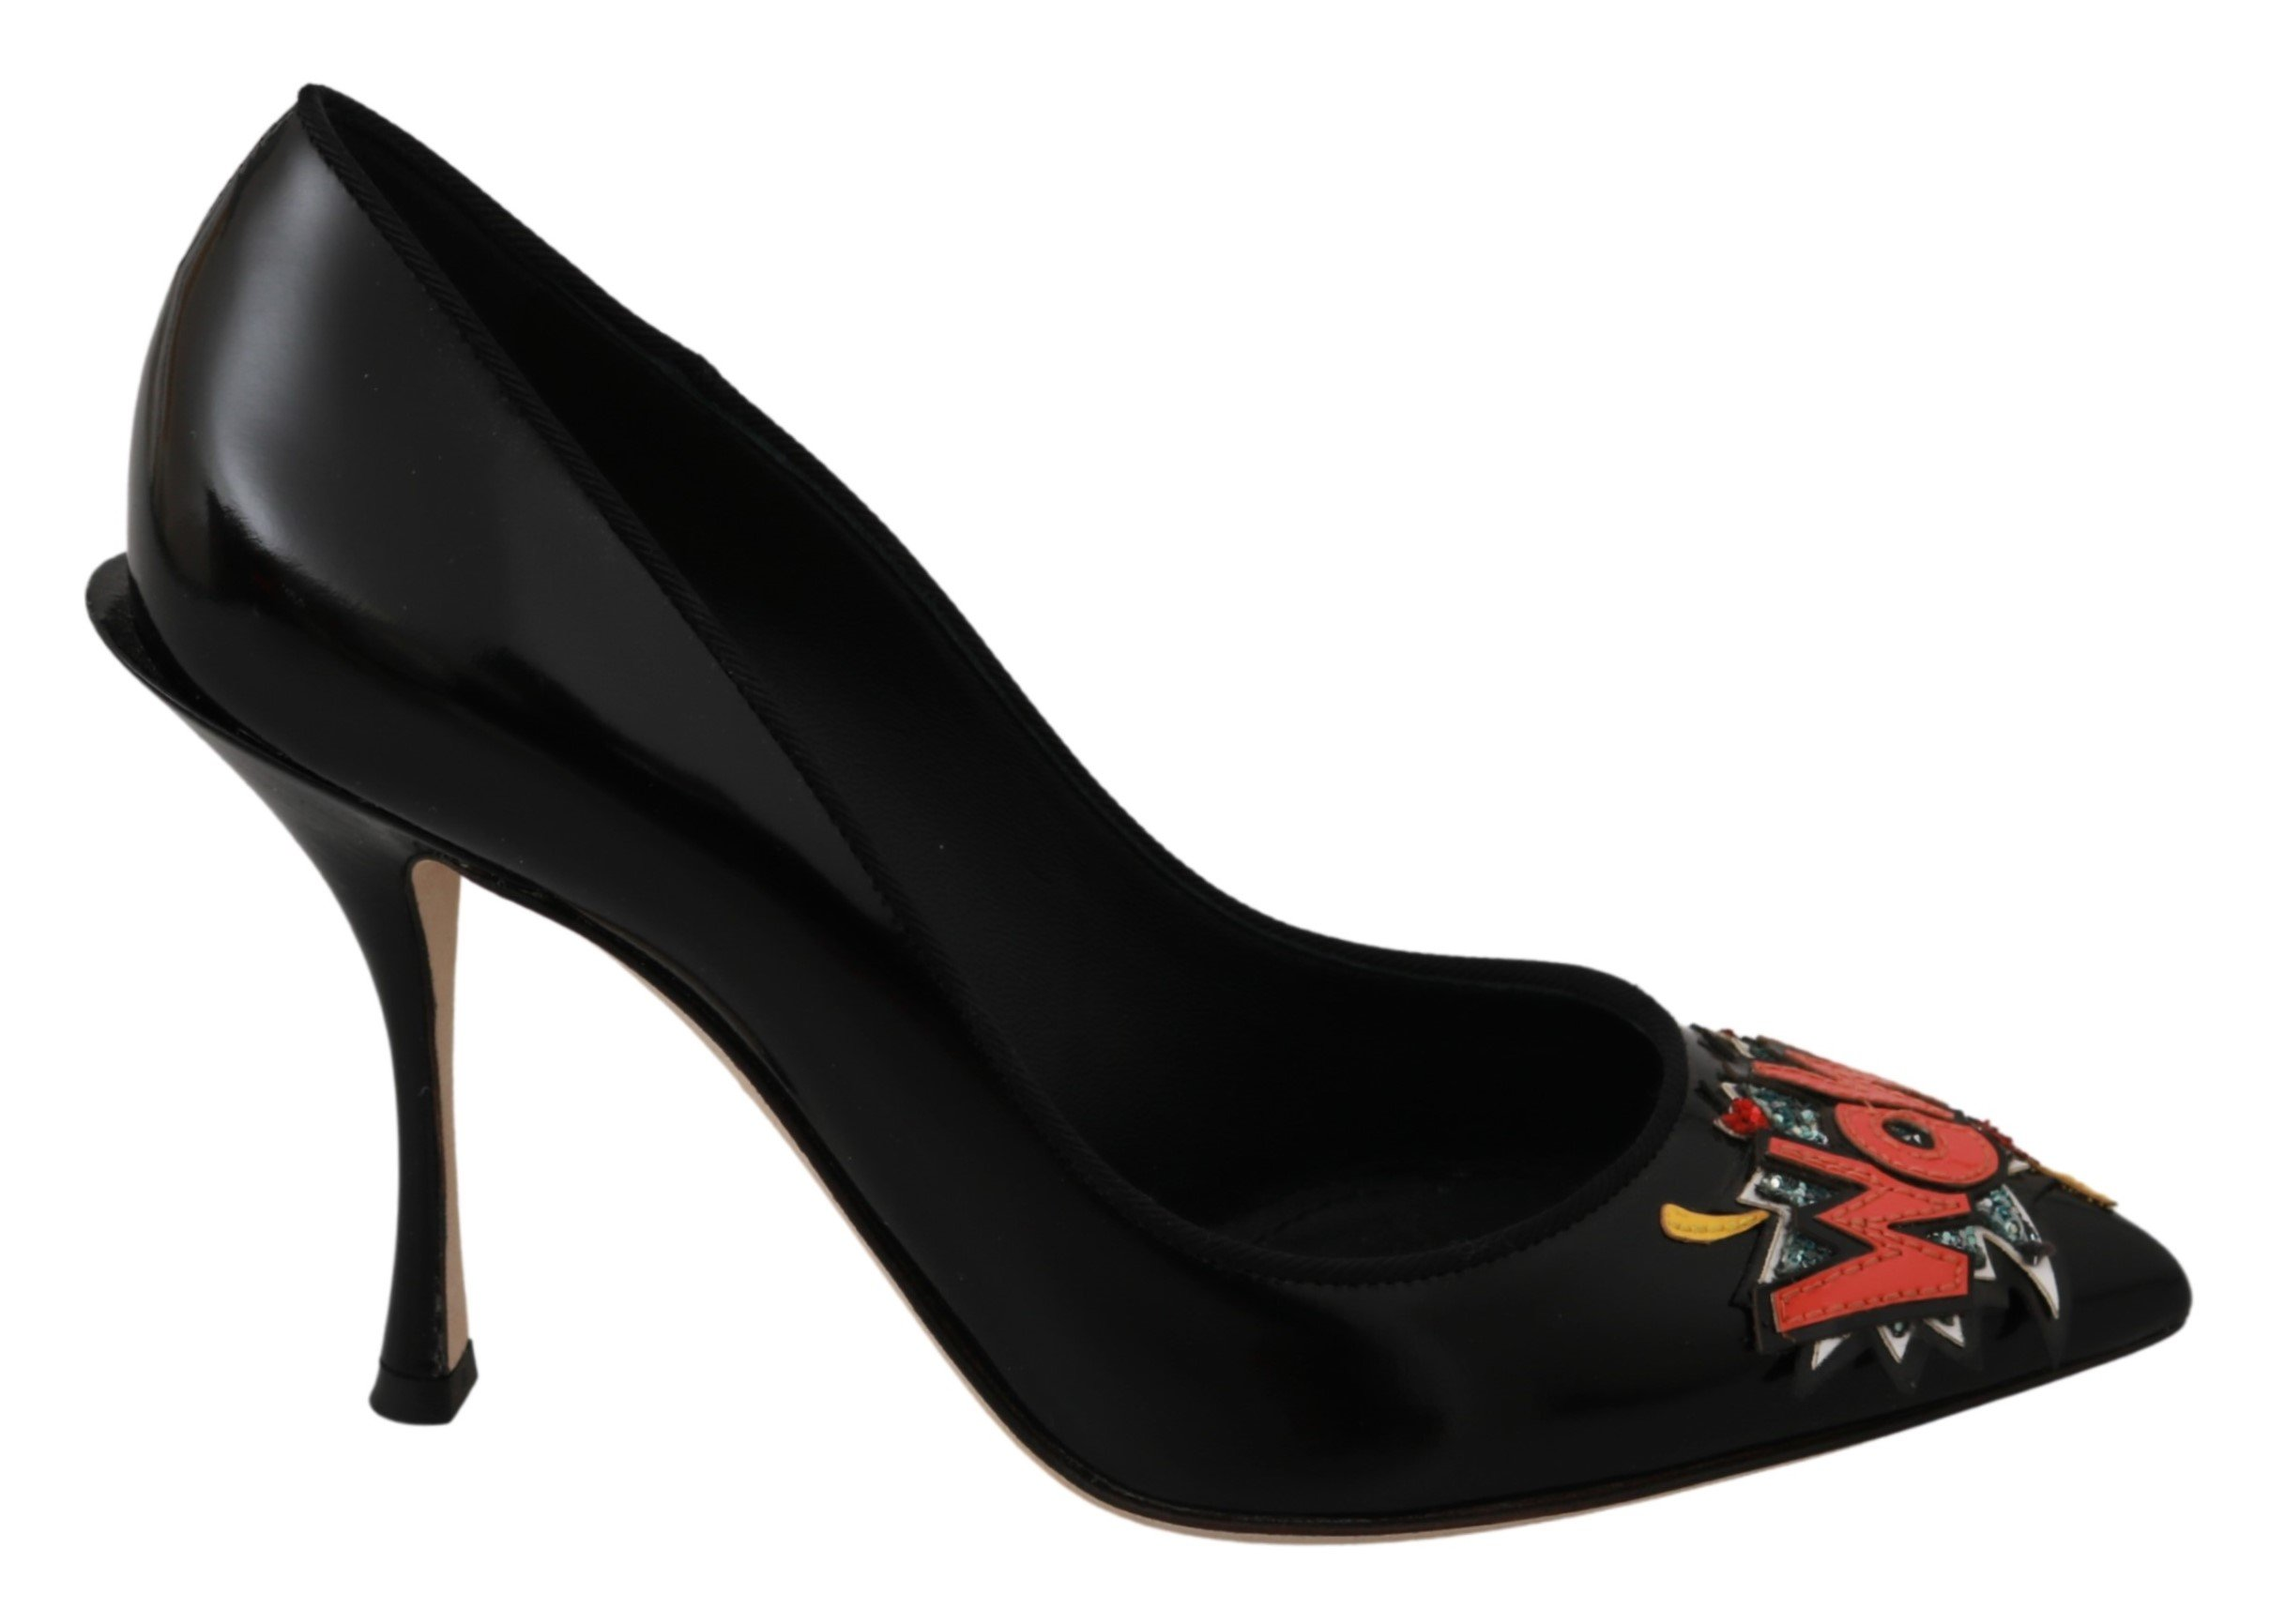 Dolce & Gabbana Women's Leather Pumps Shoe Black LA6459 - EU35/US4.5